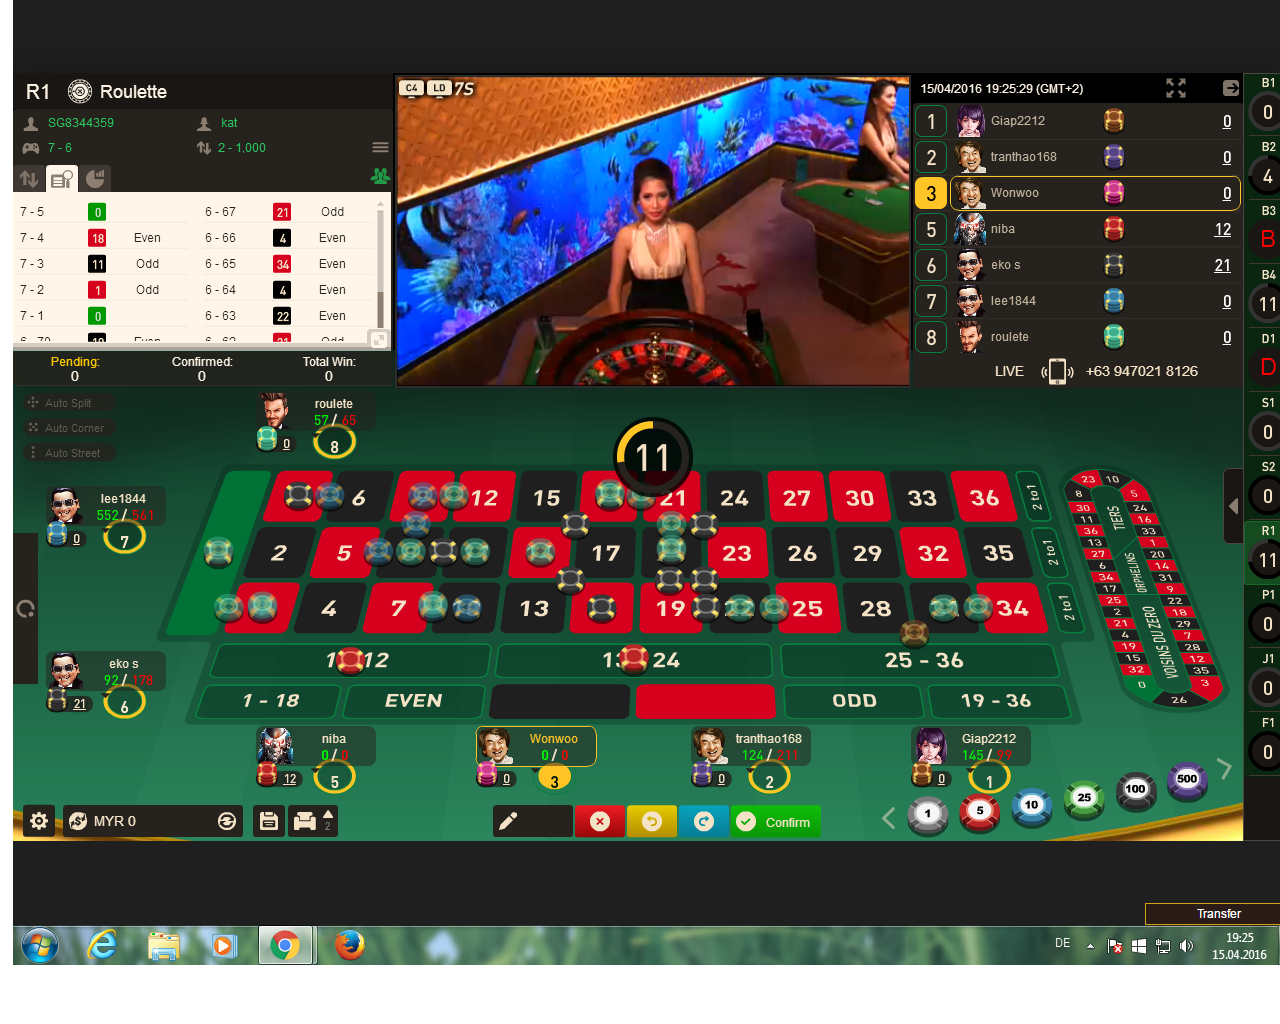 online casino seriös neues online casino